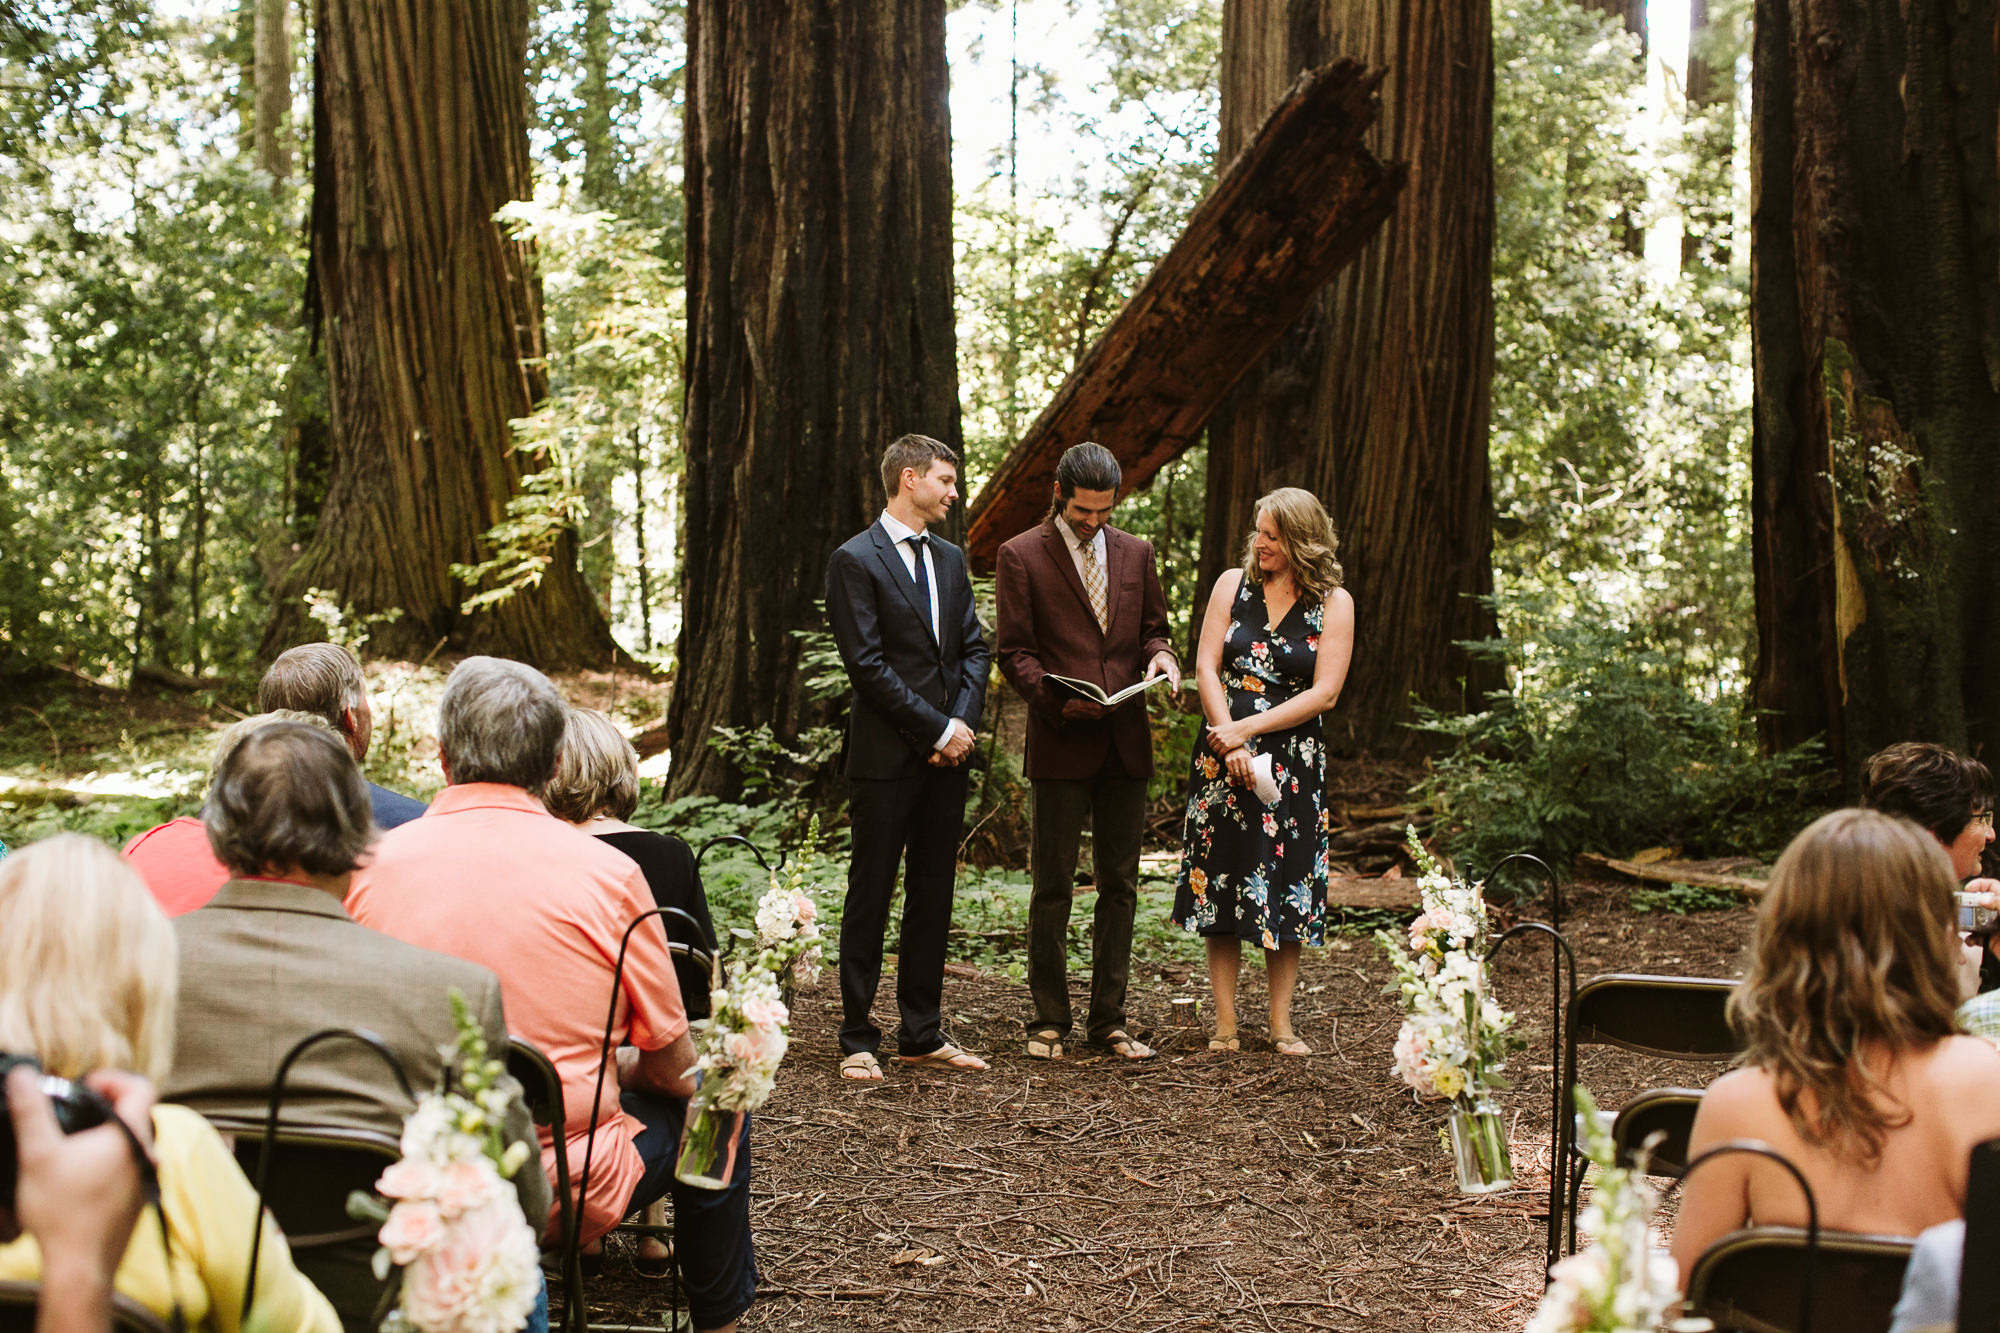 California-wedding-photographer-alfonso-flores-pamplin-groove-166.jpg